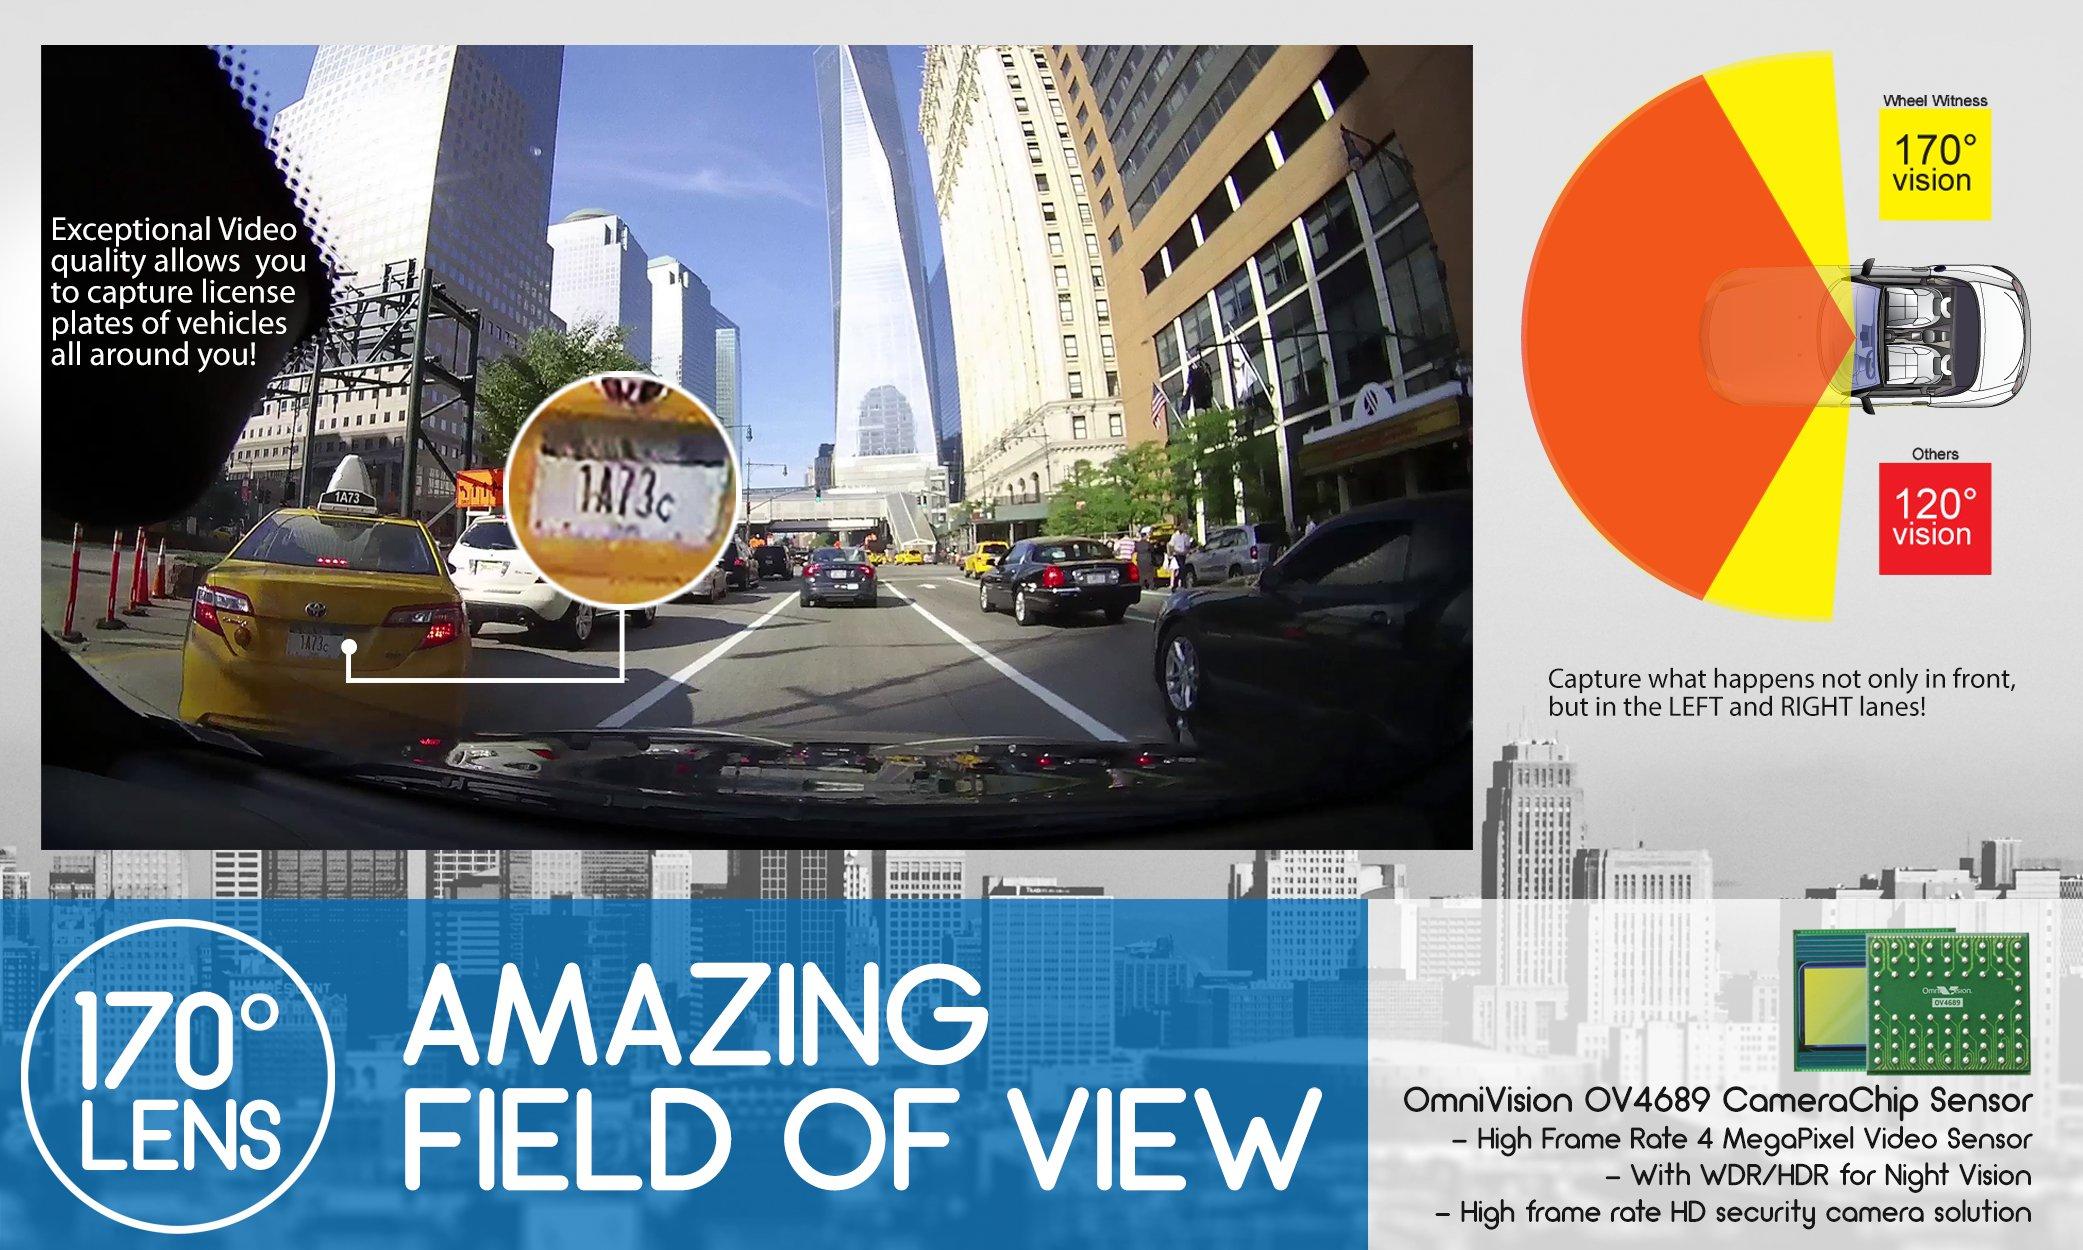 WheelWitness HD PRO Dash Cam with GPS - 2K Super HD - 170° Lens - 16GB microSD - Advanced Driver Assistance - For 12V Cars & Trucks - Night Vision Dashboard Camera Ambarella A7LA50 Car Security DVR by WheelWitness (Image #3)